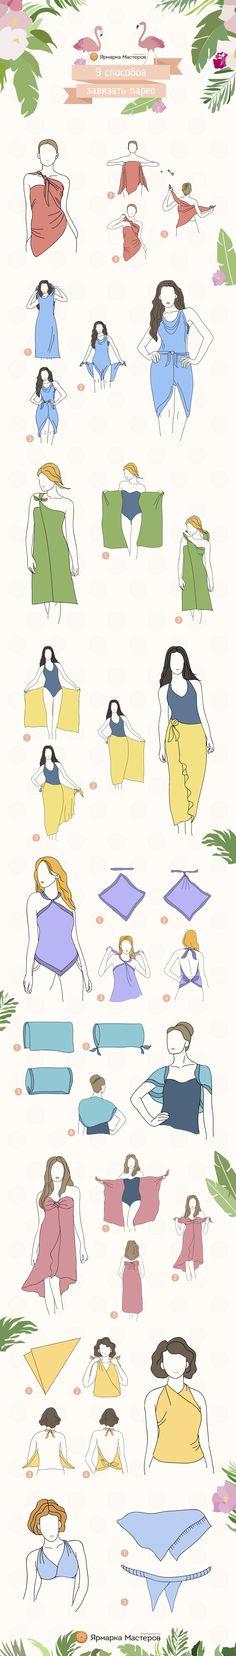 How to tie pareo and sarong | Как быстро и красиво завязать парео: инфографика от Ярмарки Мастеров - Ярмарка Мастеров - ручная работа, handmade